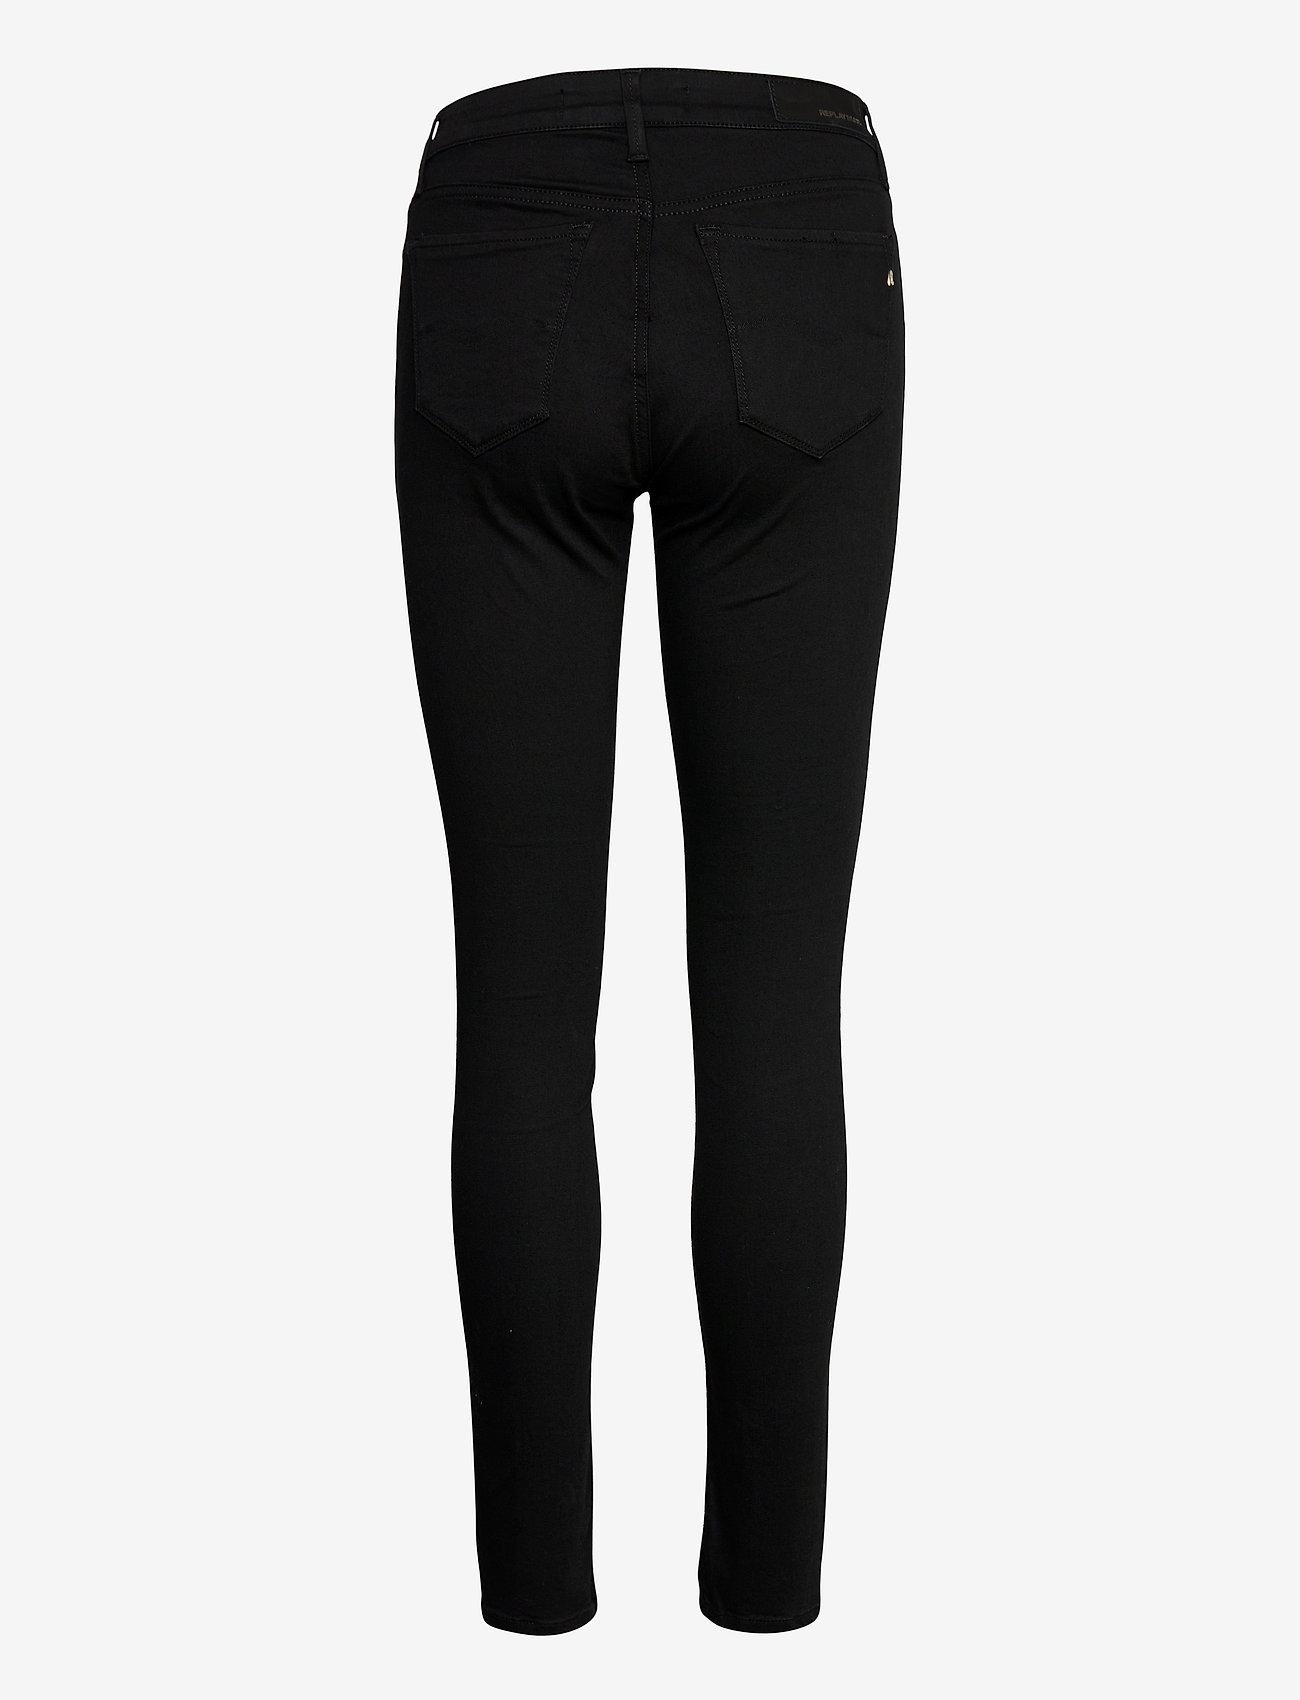 Replay - LUZIEN - slim jeans - black - 1